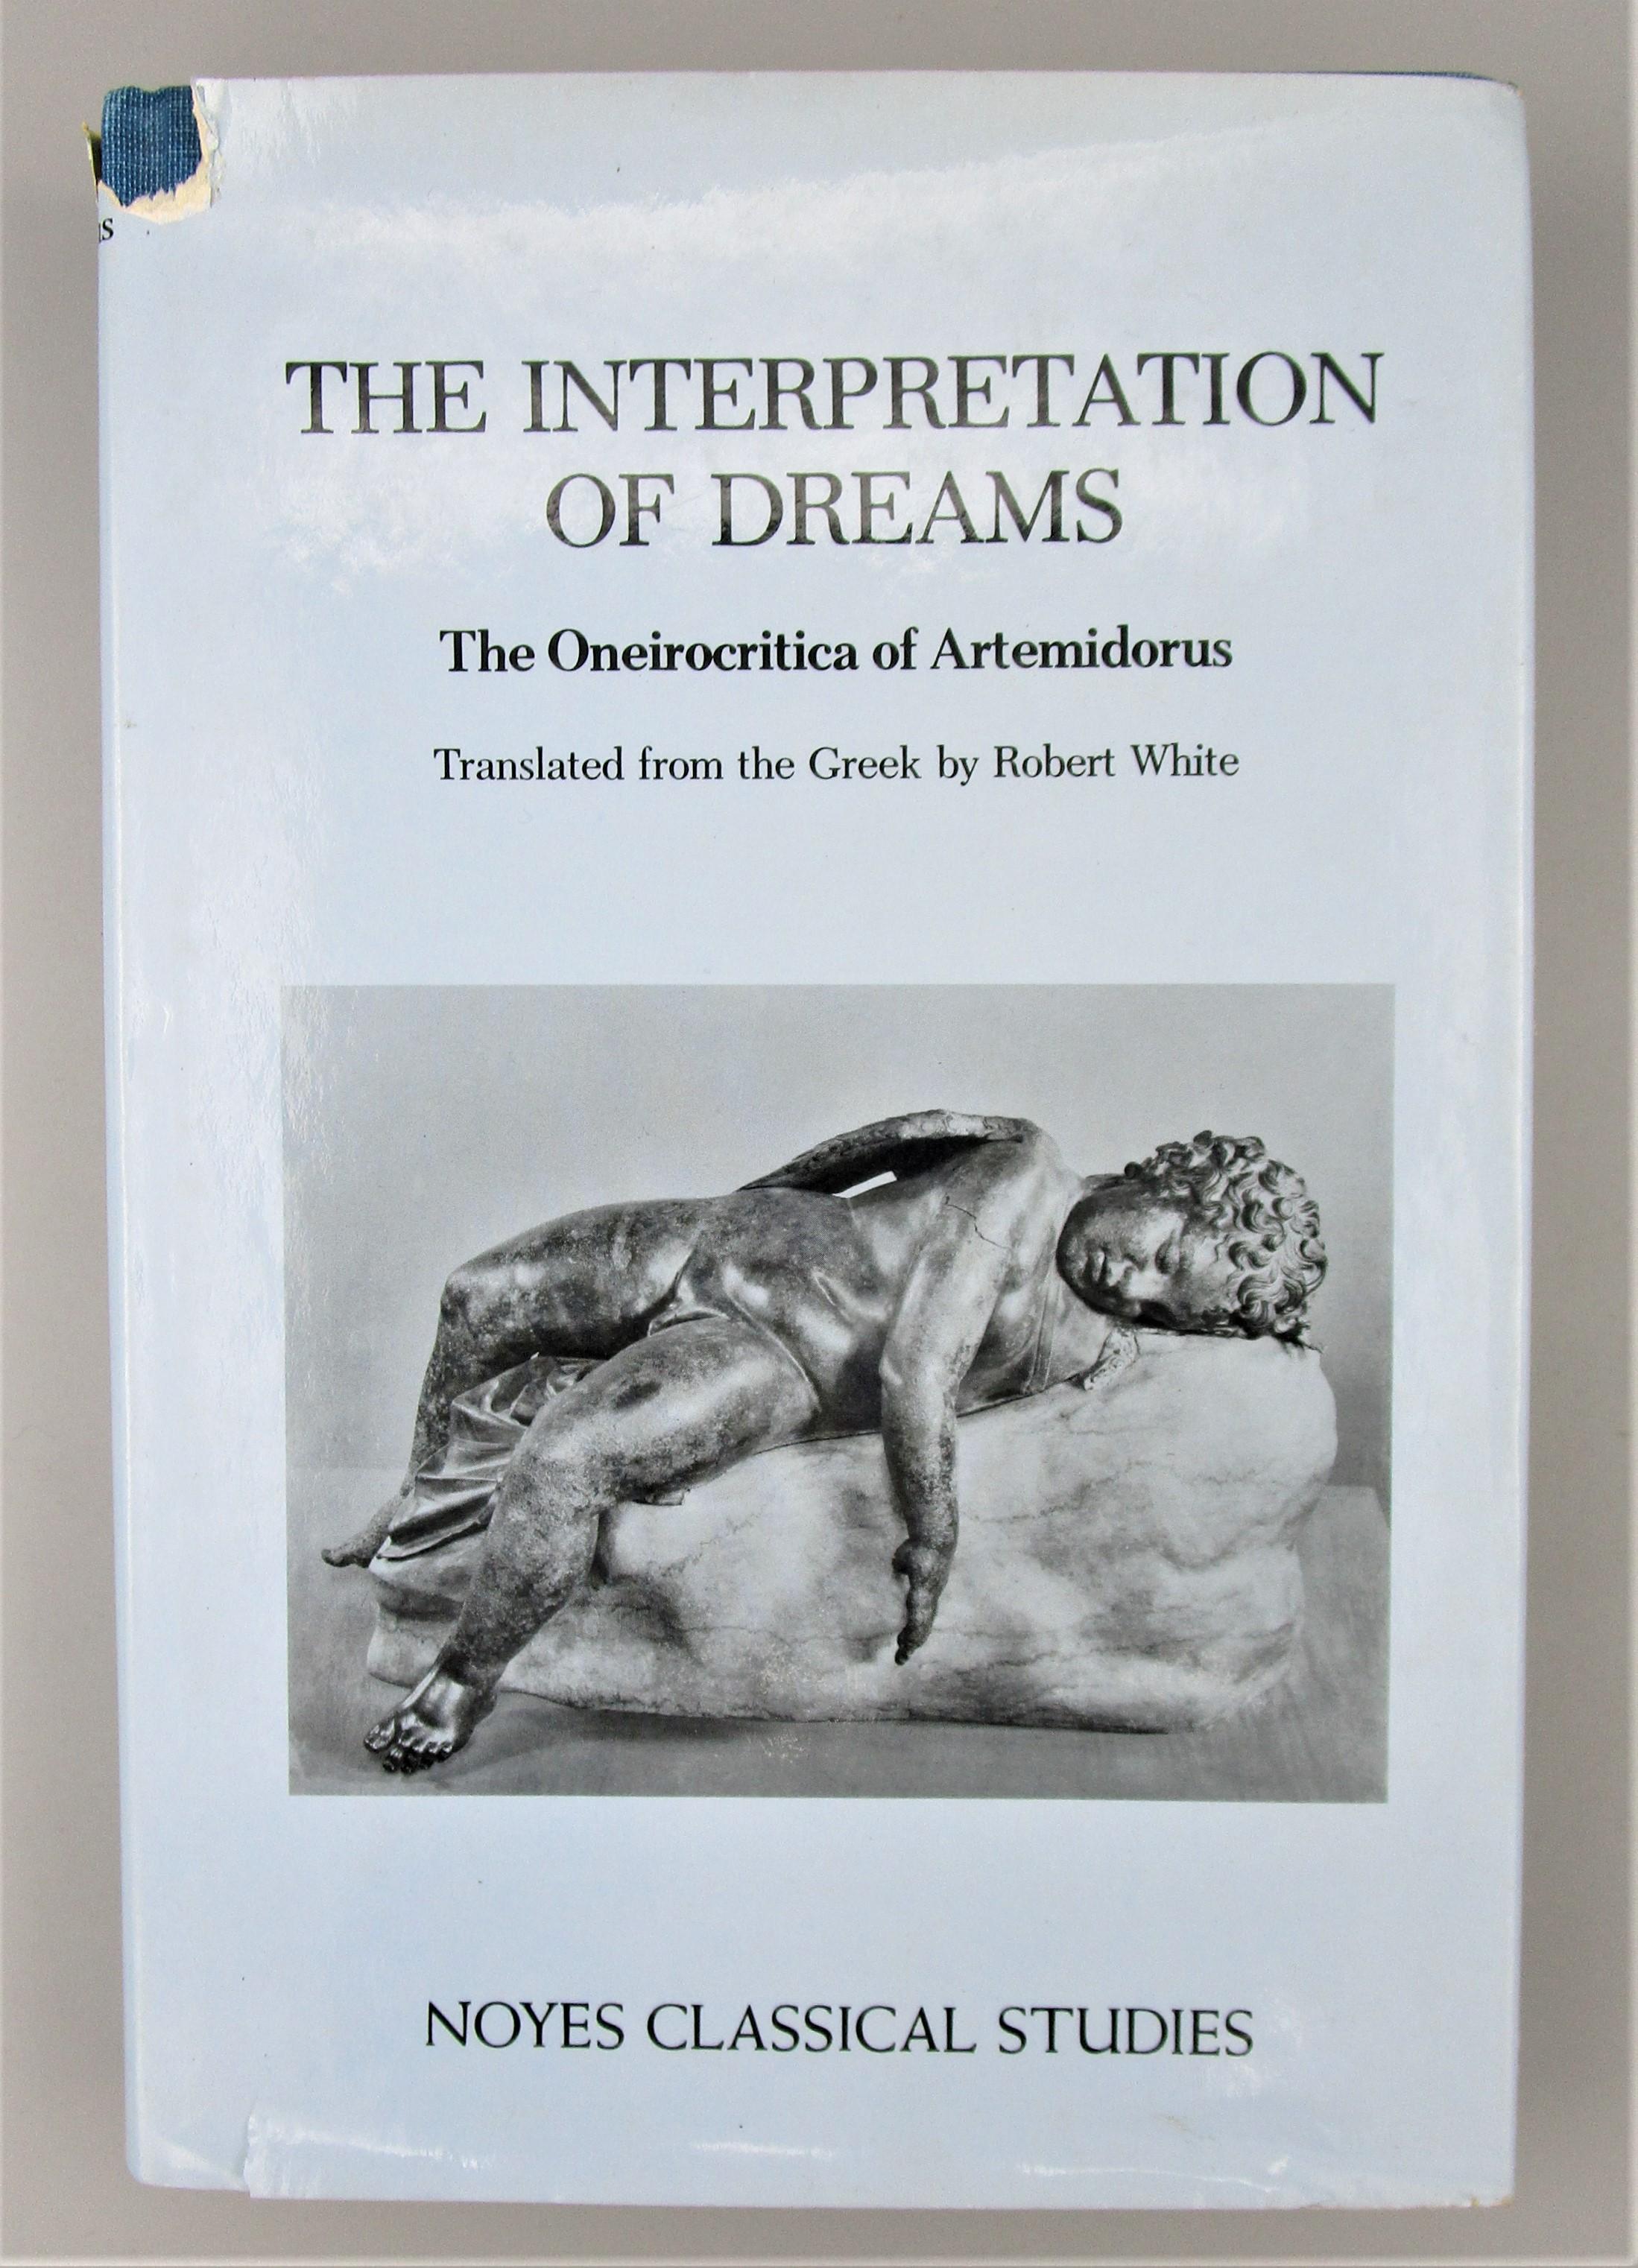 INTERPRETATION Of DREAMS: THE ONEIROCRITICA, by Artemidorus; Robert White - 1975